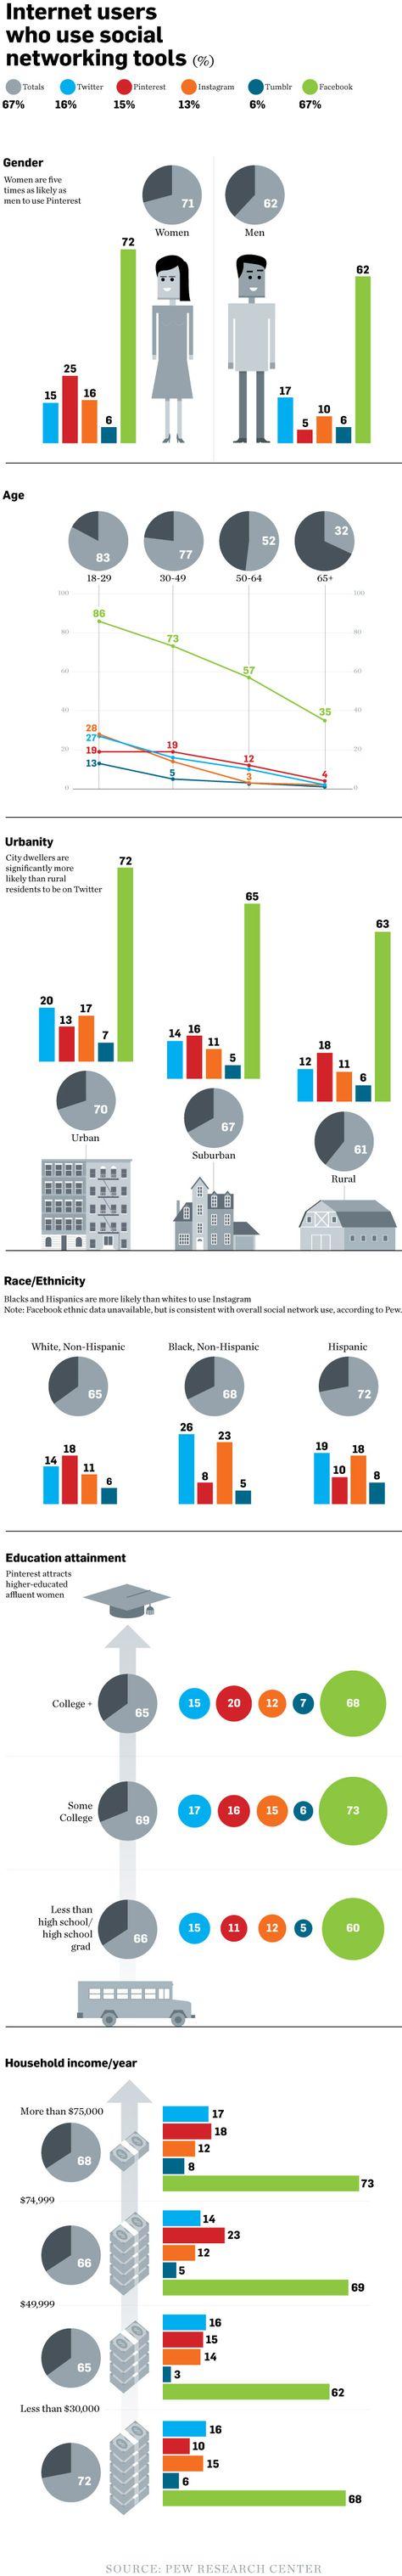 Blacks and Hispanics More Likely Than Whites to Use Twitter